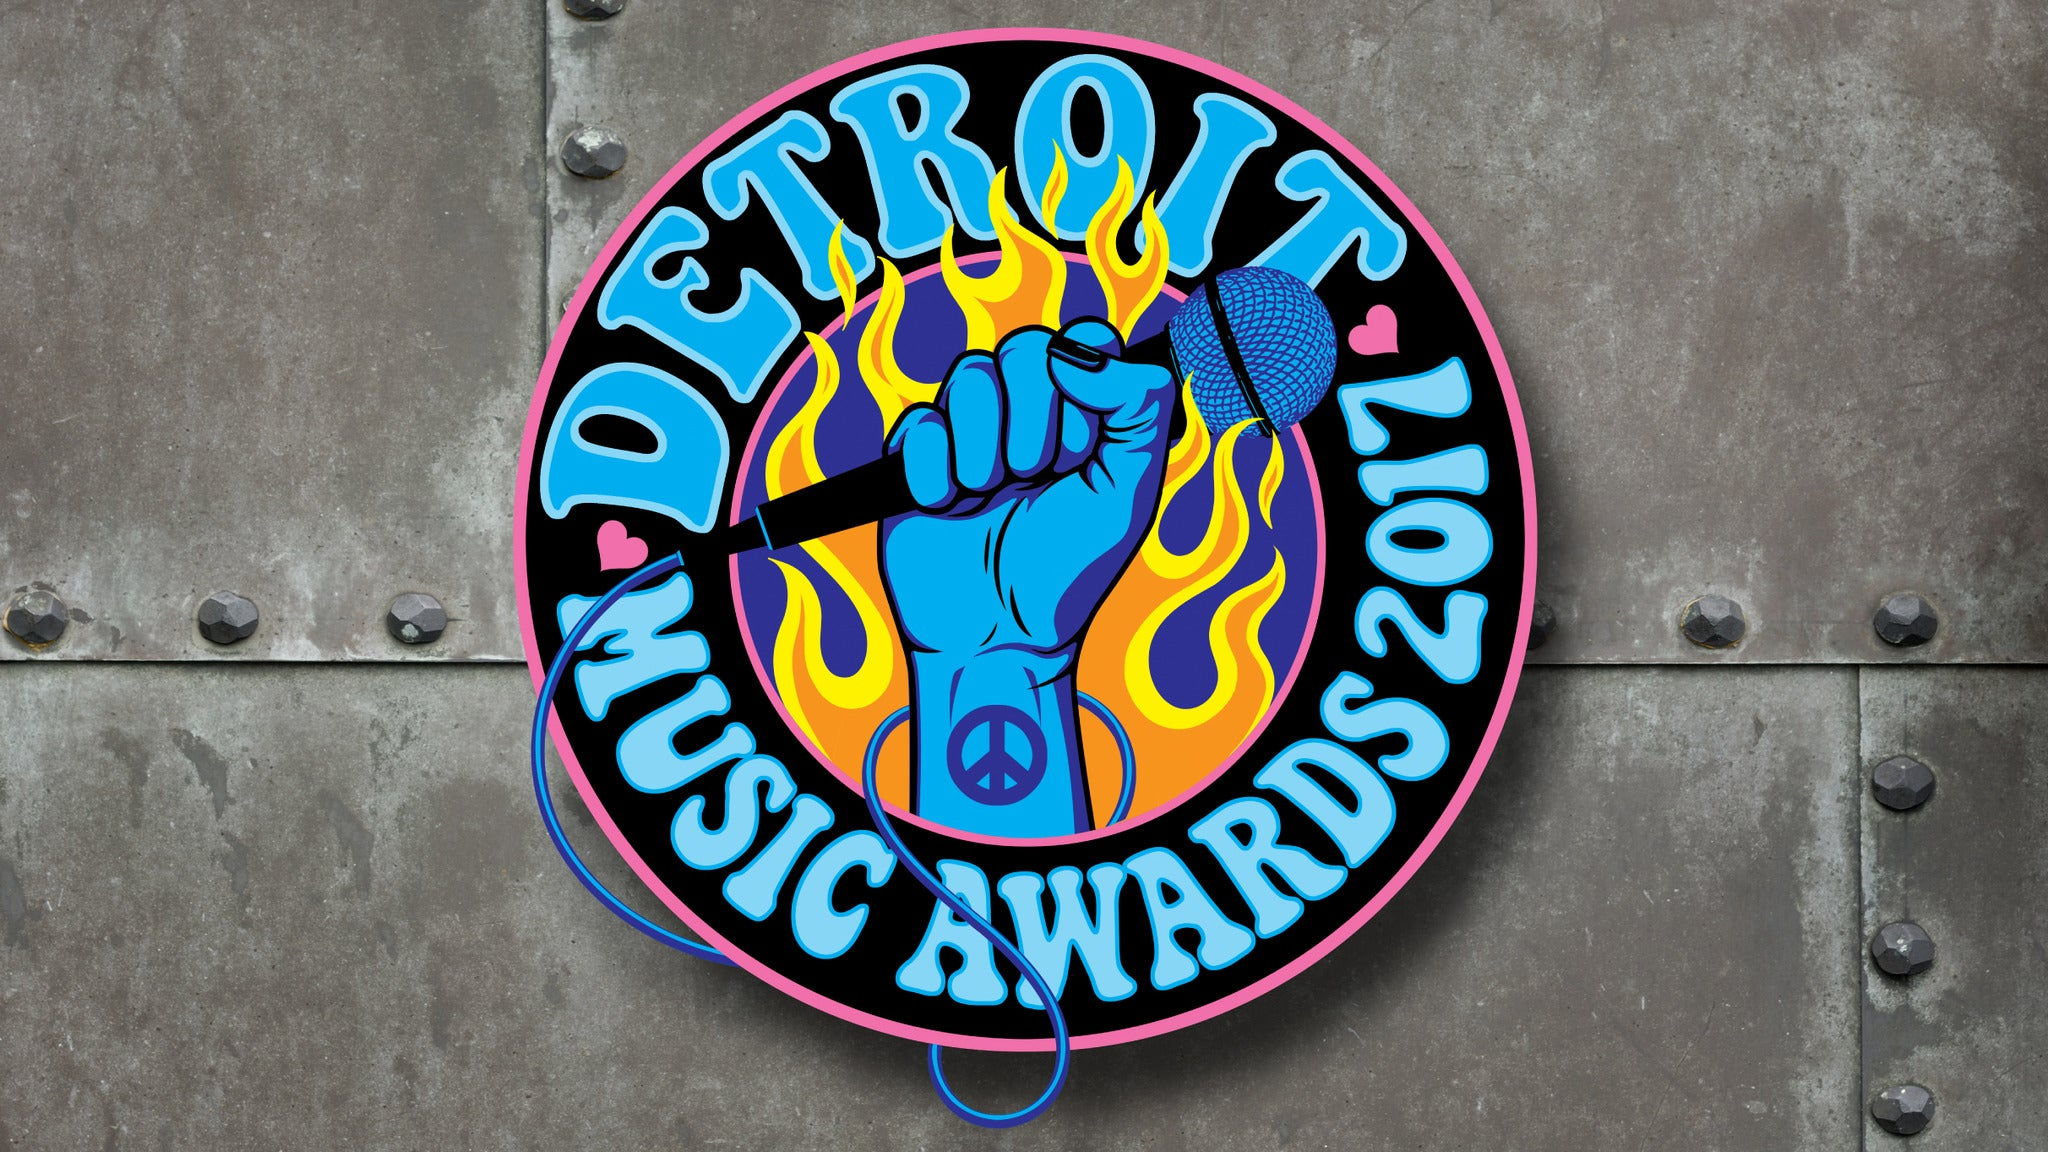 Detroit Music Awards at The Fillmore Detroit